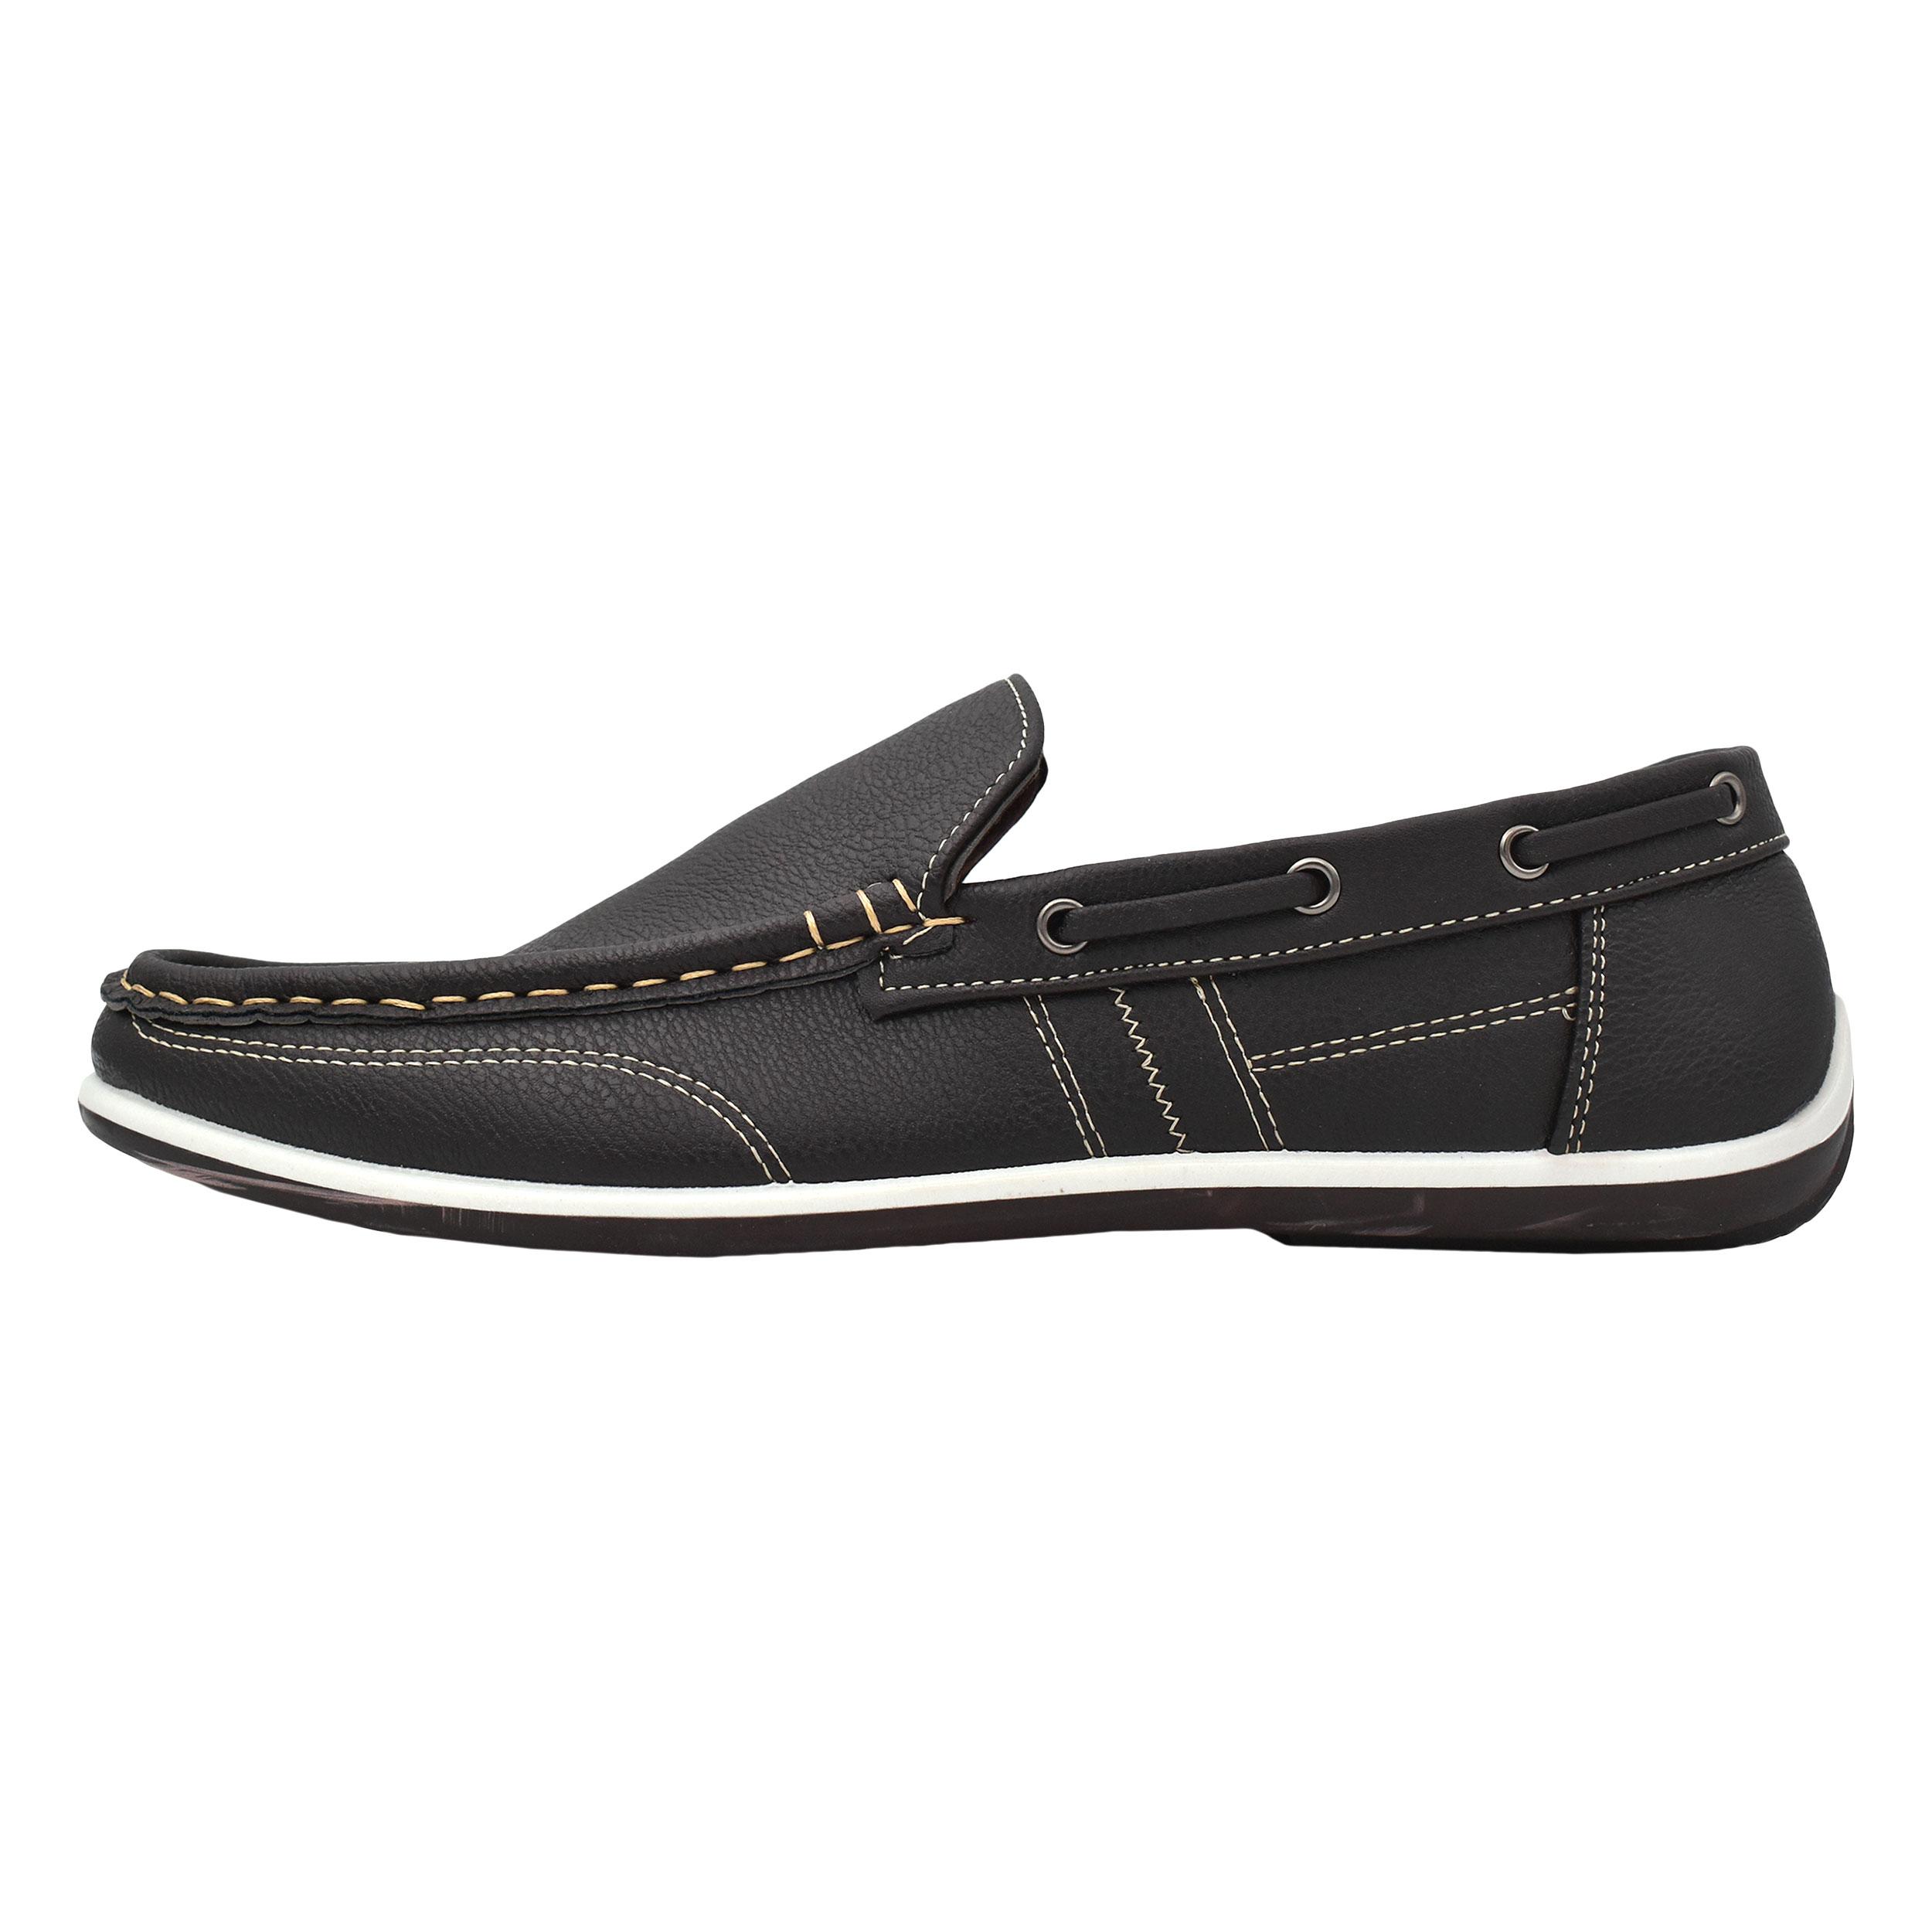 کفش روزمره مردانه پاما مدل K52 کد G1209